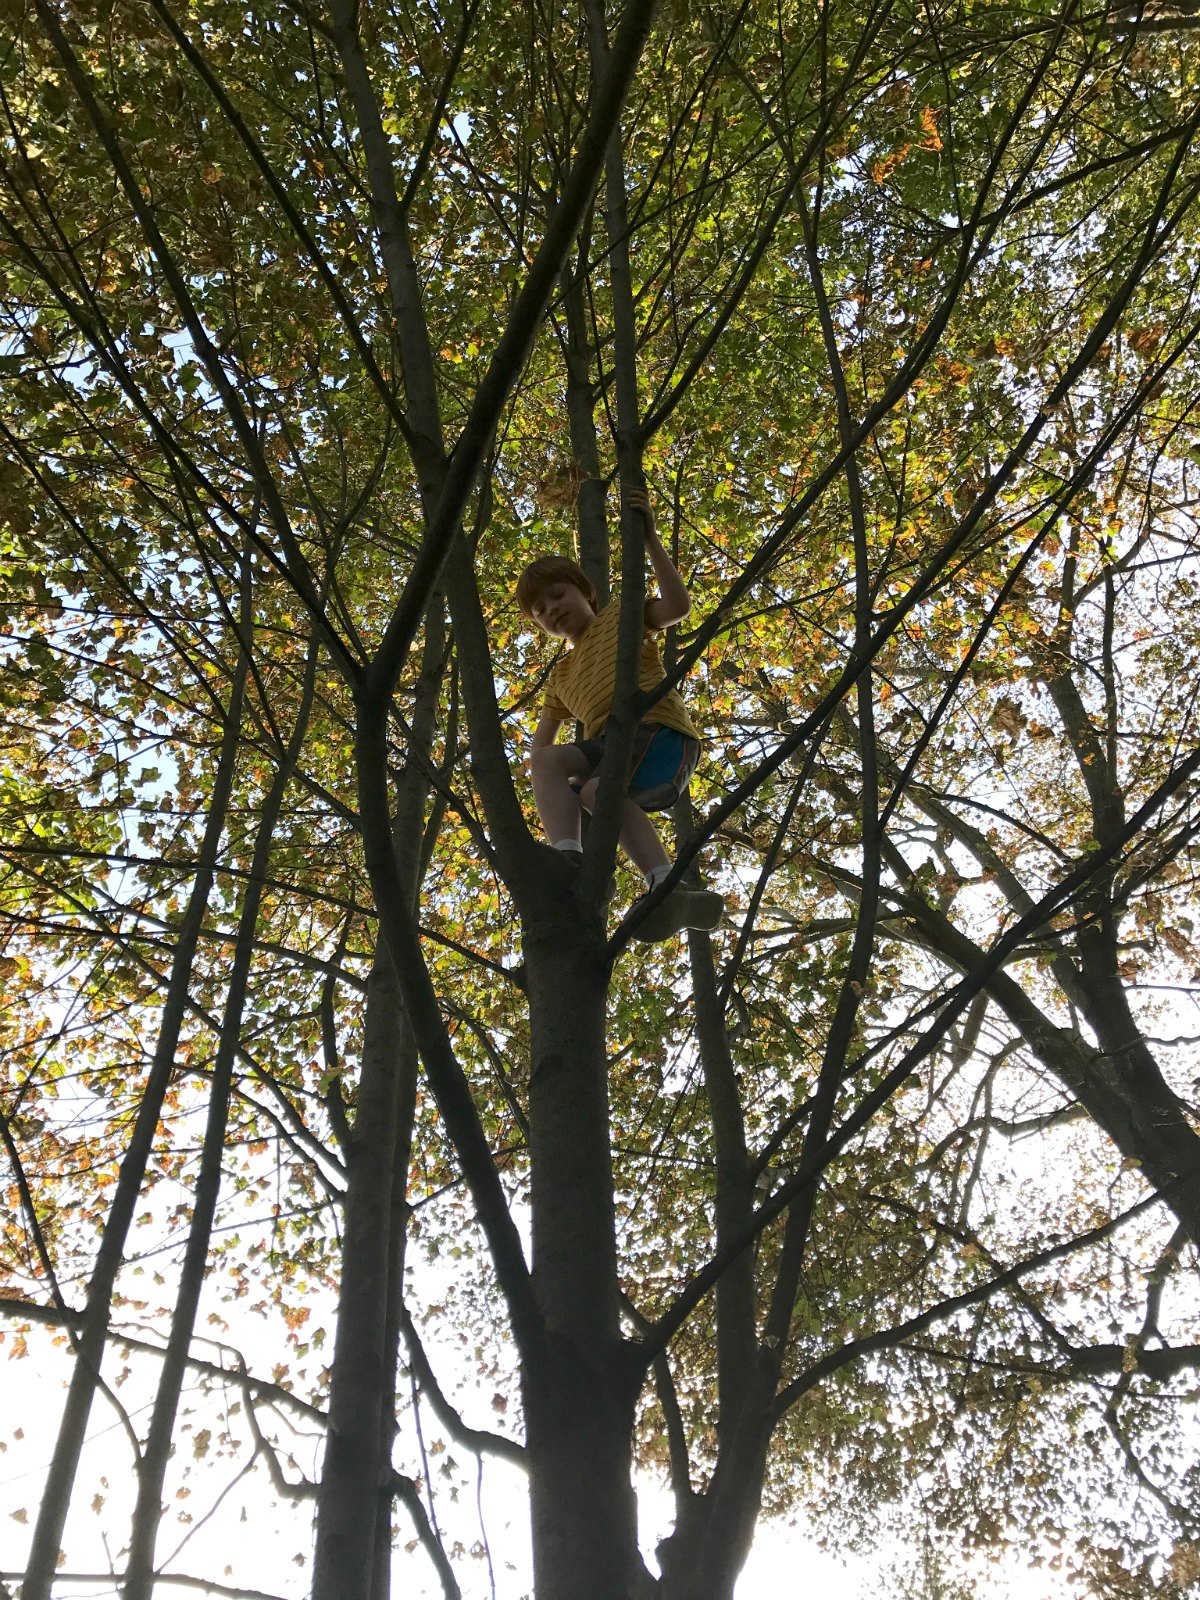 Snapshots from tree climbing adventures 1